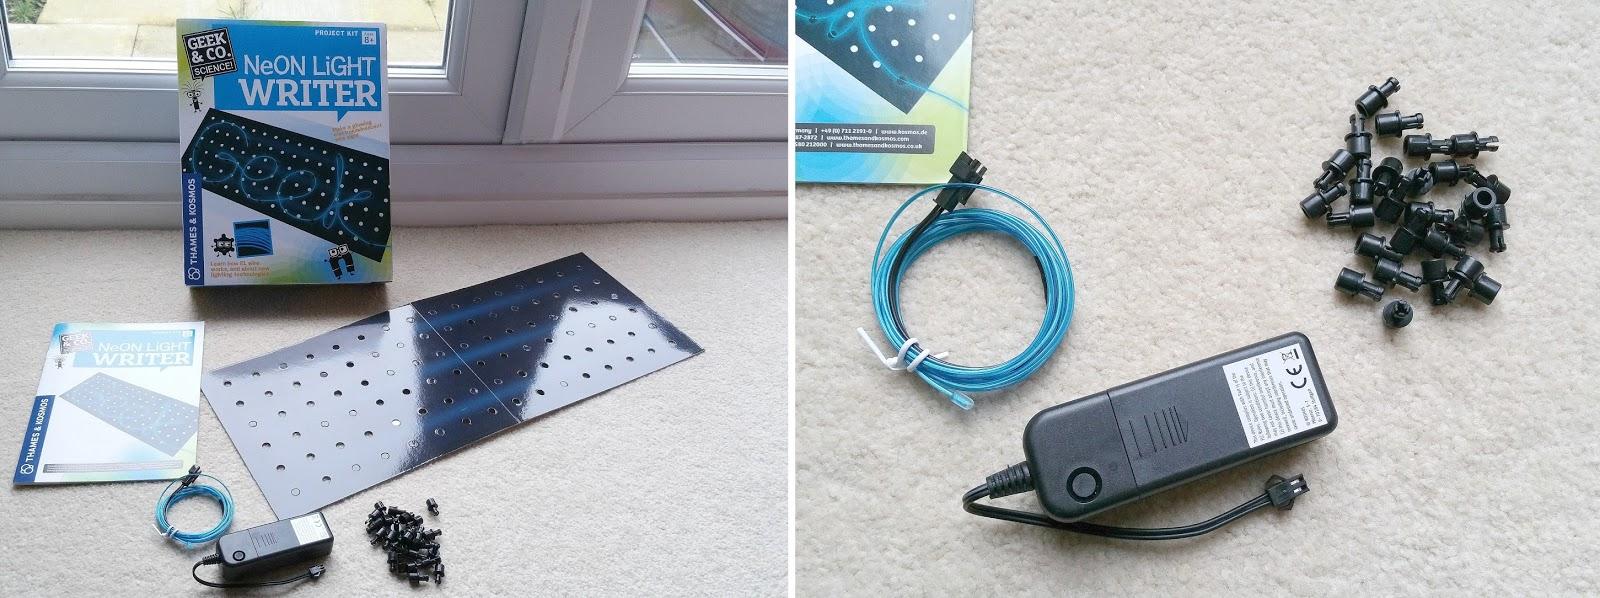 Thames and Kosmos STEM kits, Neon Light Writer, Slime Time